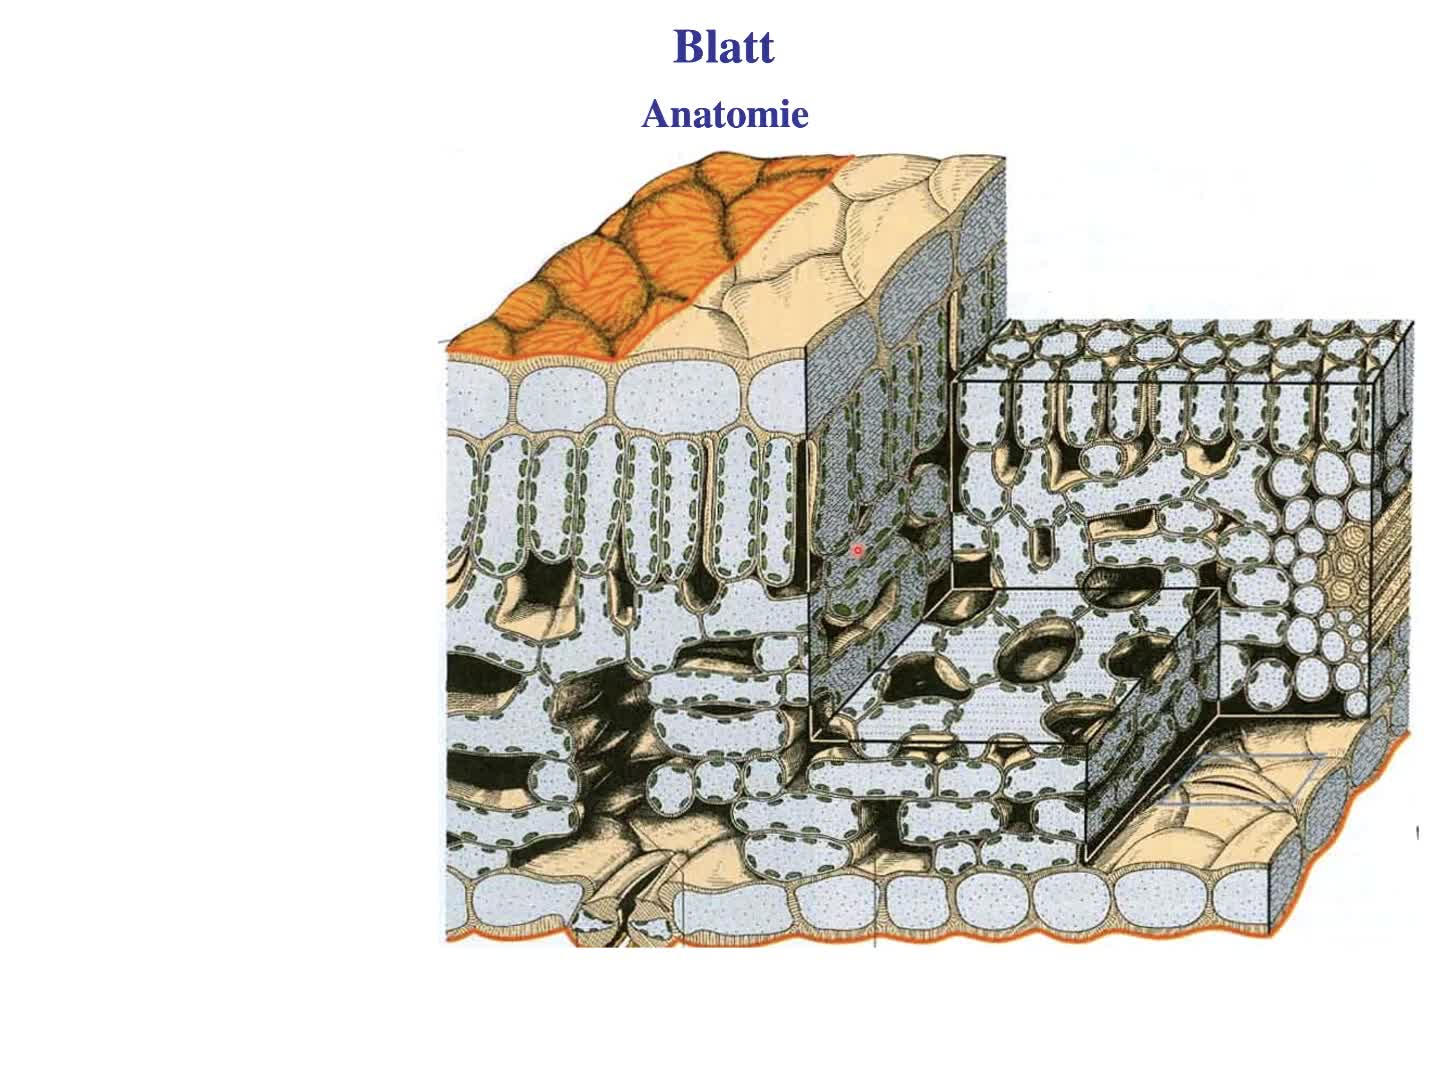 Blatt: Anatomie preview image